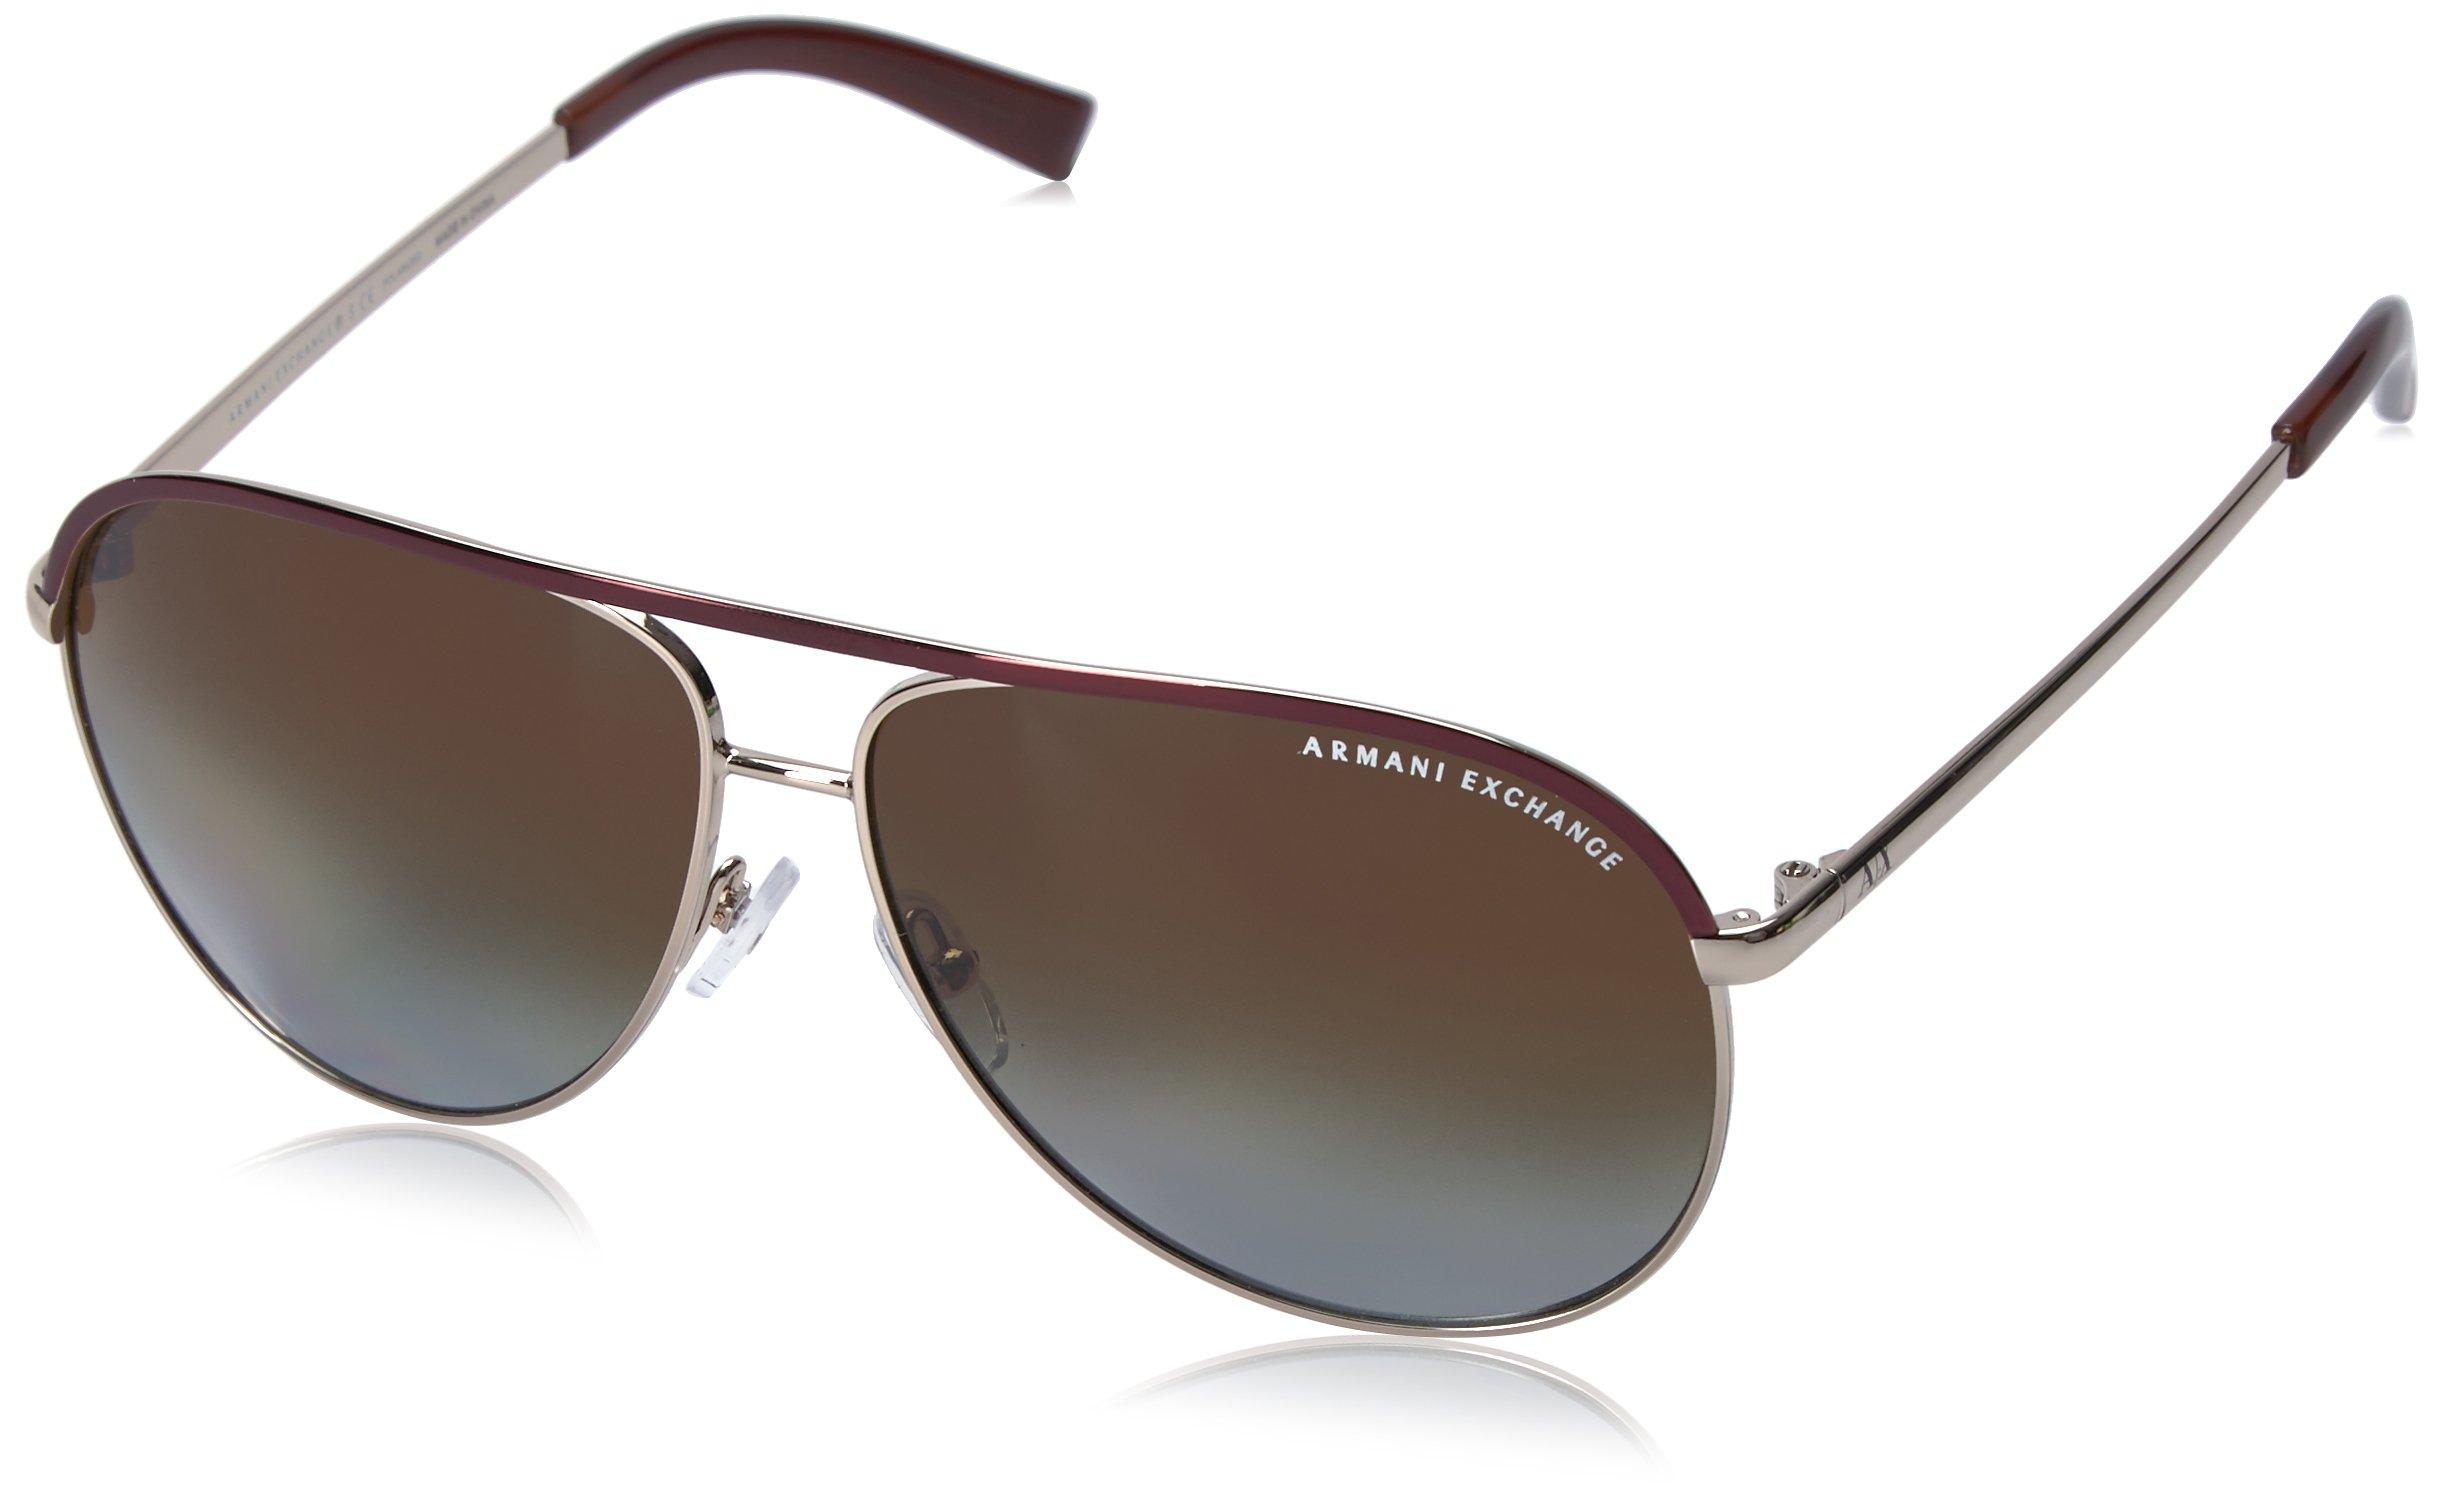 Armani Exchange Metal Unisex Polarized Aviator Sunglasses, Light Gold/Dark Brown, 61 mm by A|X Armani Exchange (Image #2)